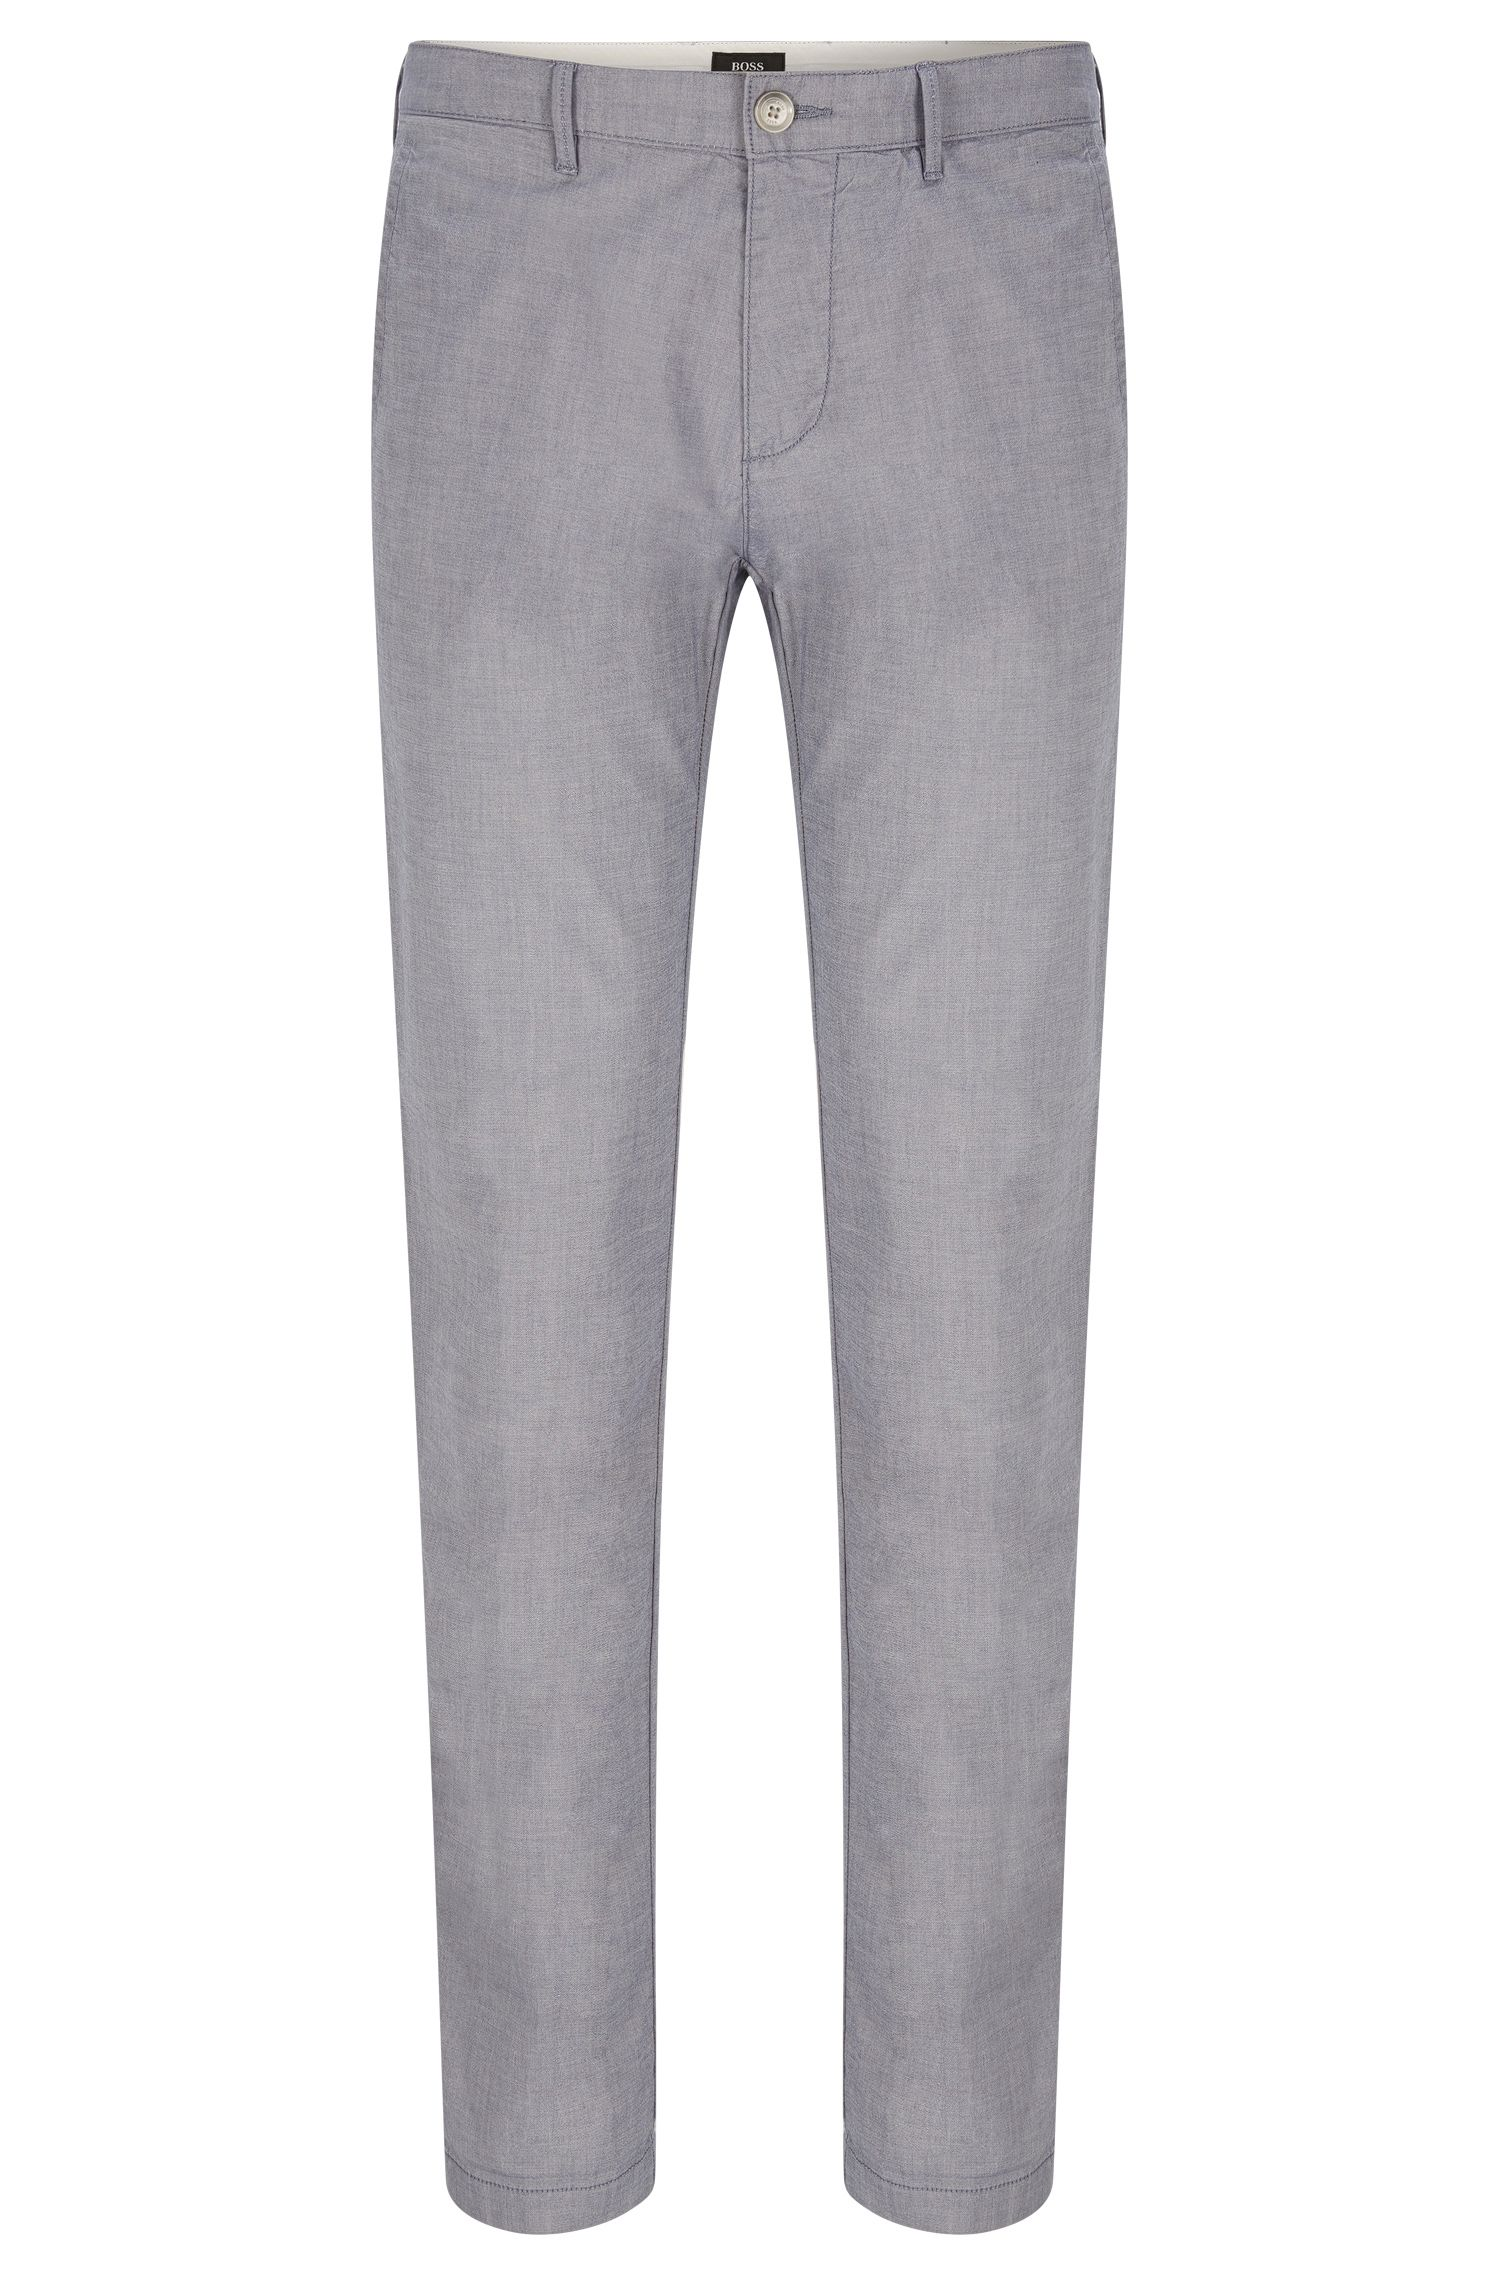 Yarn Dyed Stretch Cotton Pants, Regular Fit | Crigan